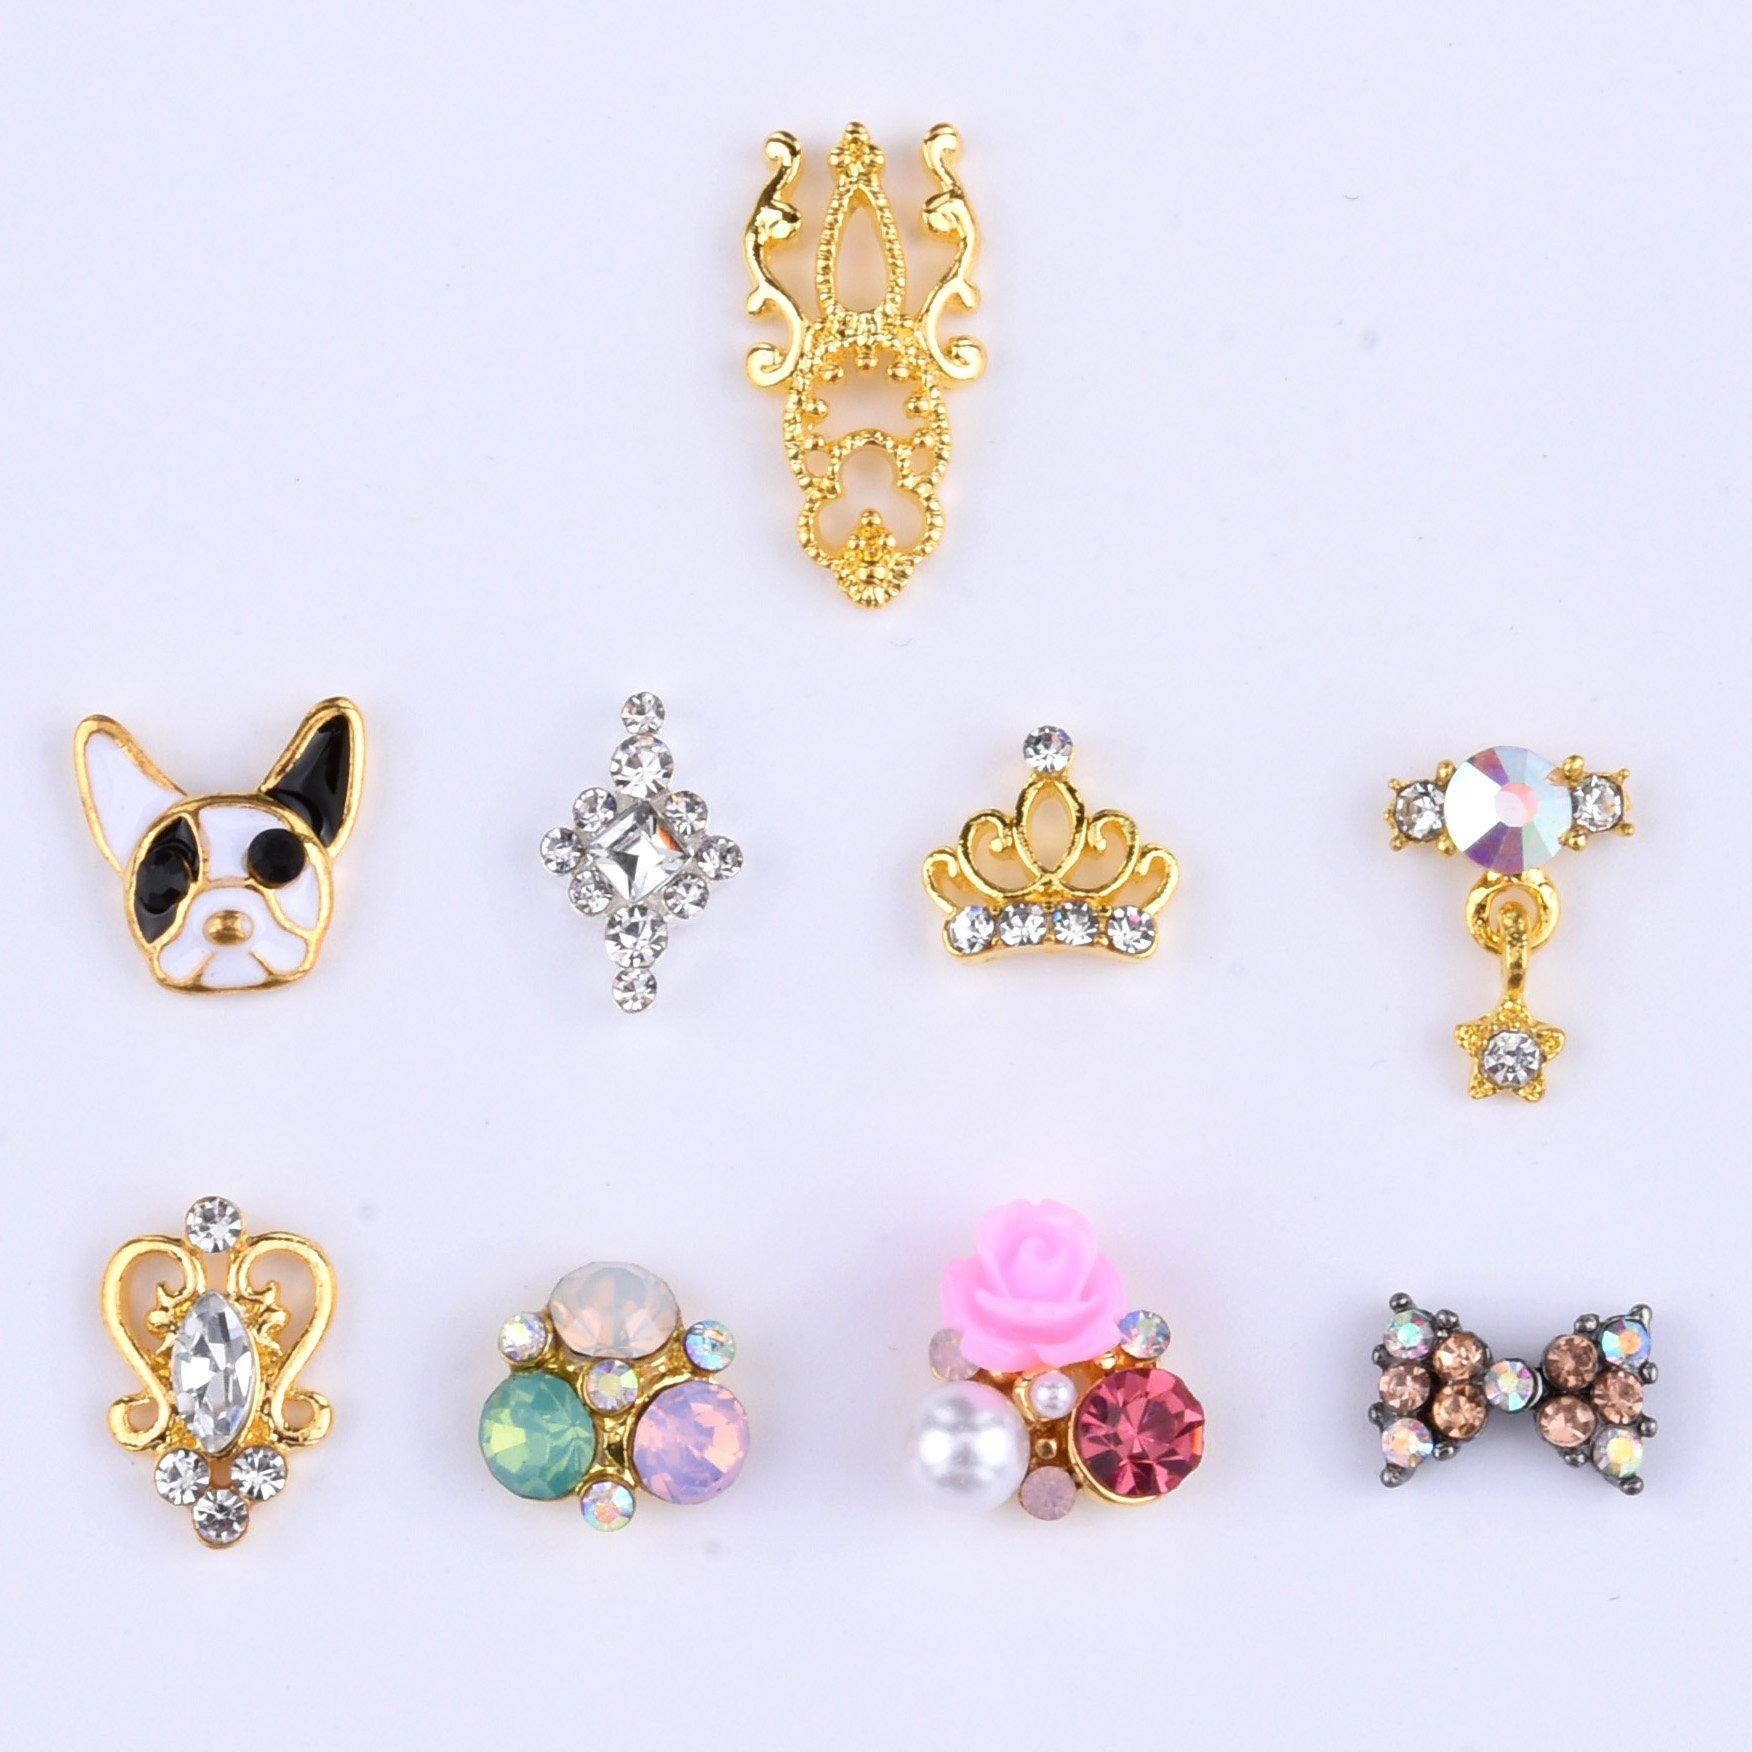 Amazon.com: Crystal Nail Decoration Bow Elegant Flower Jewelry ...